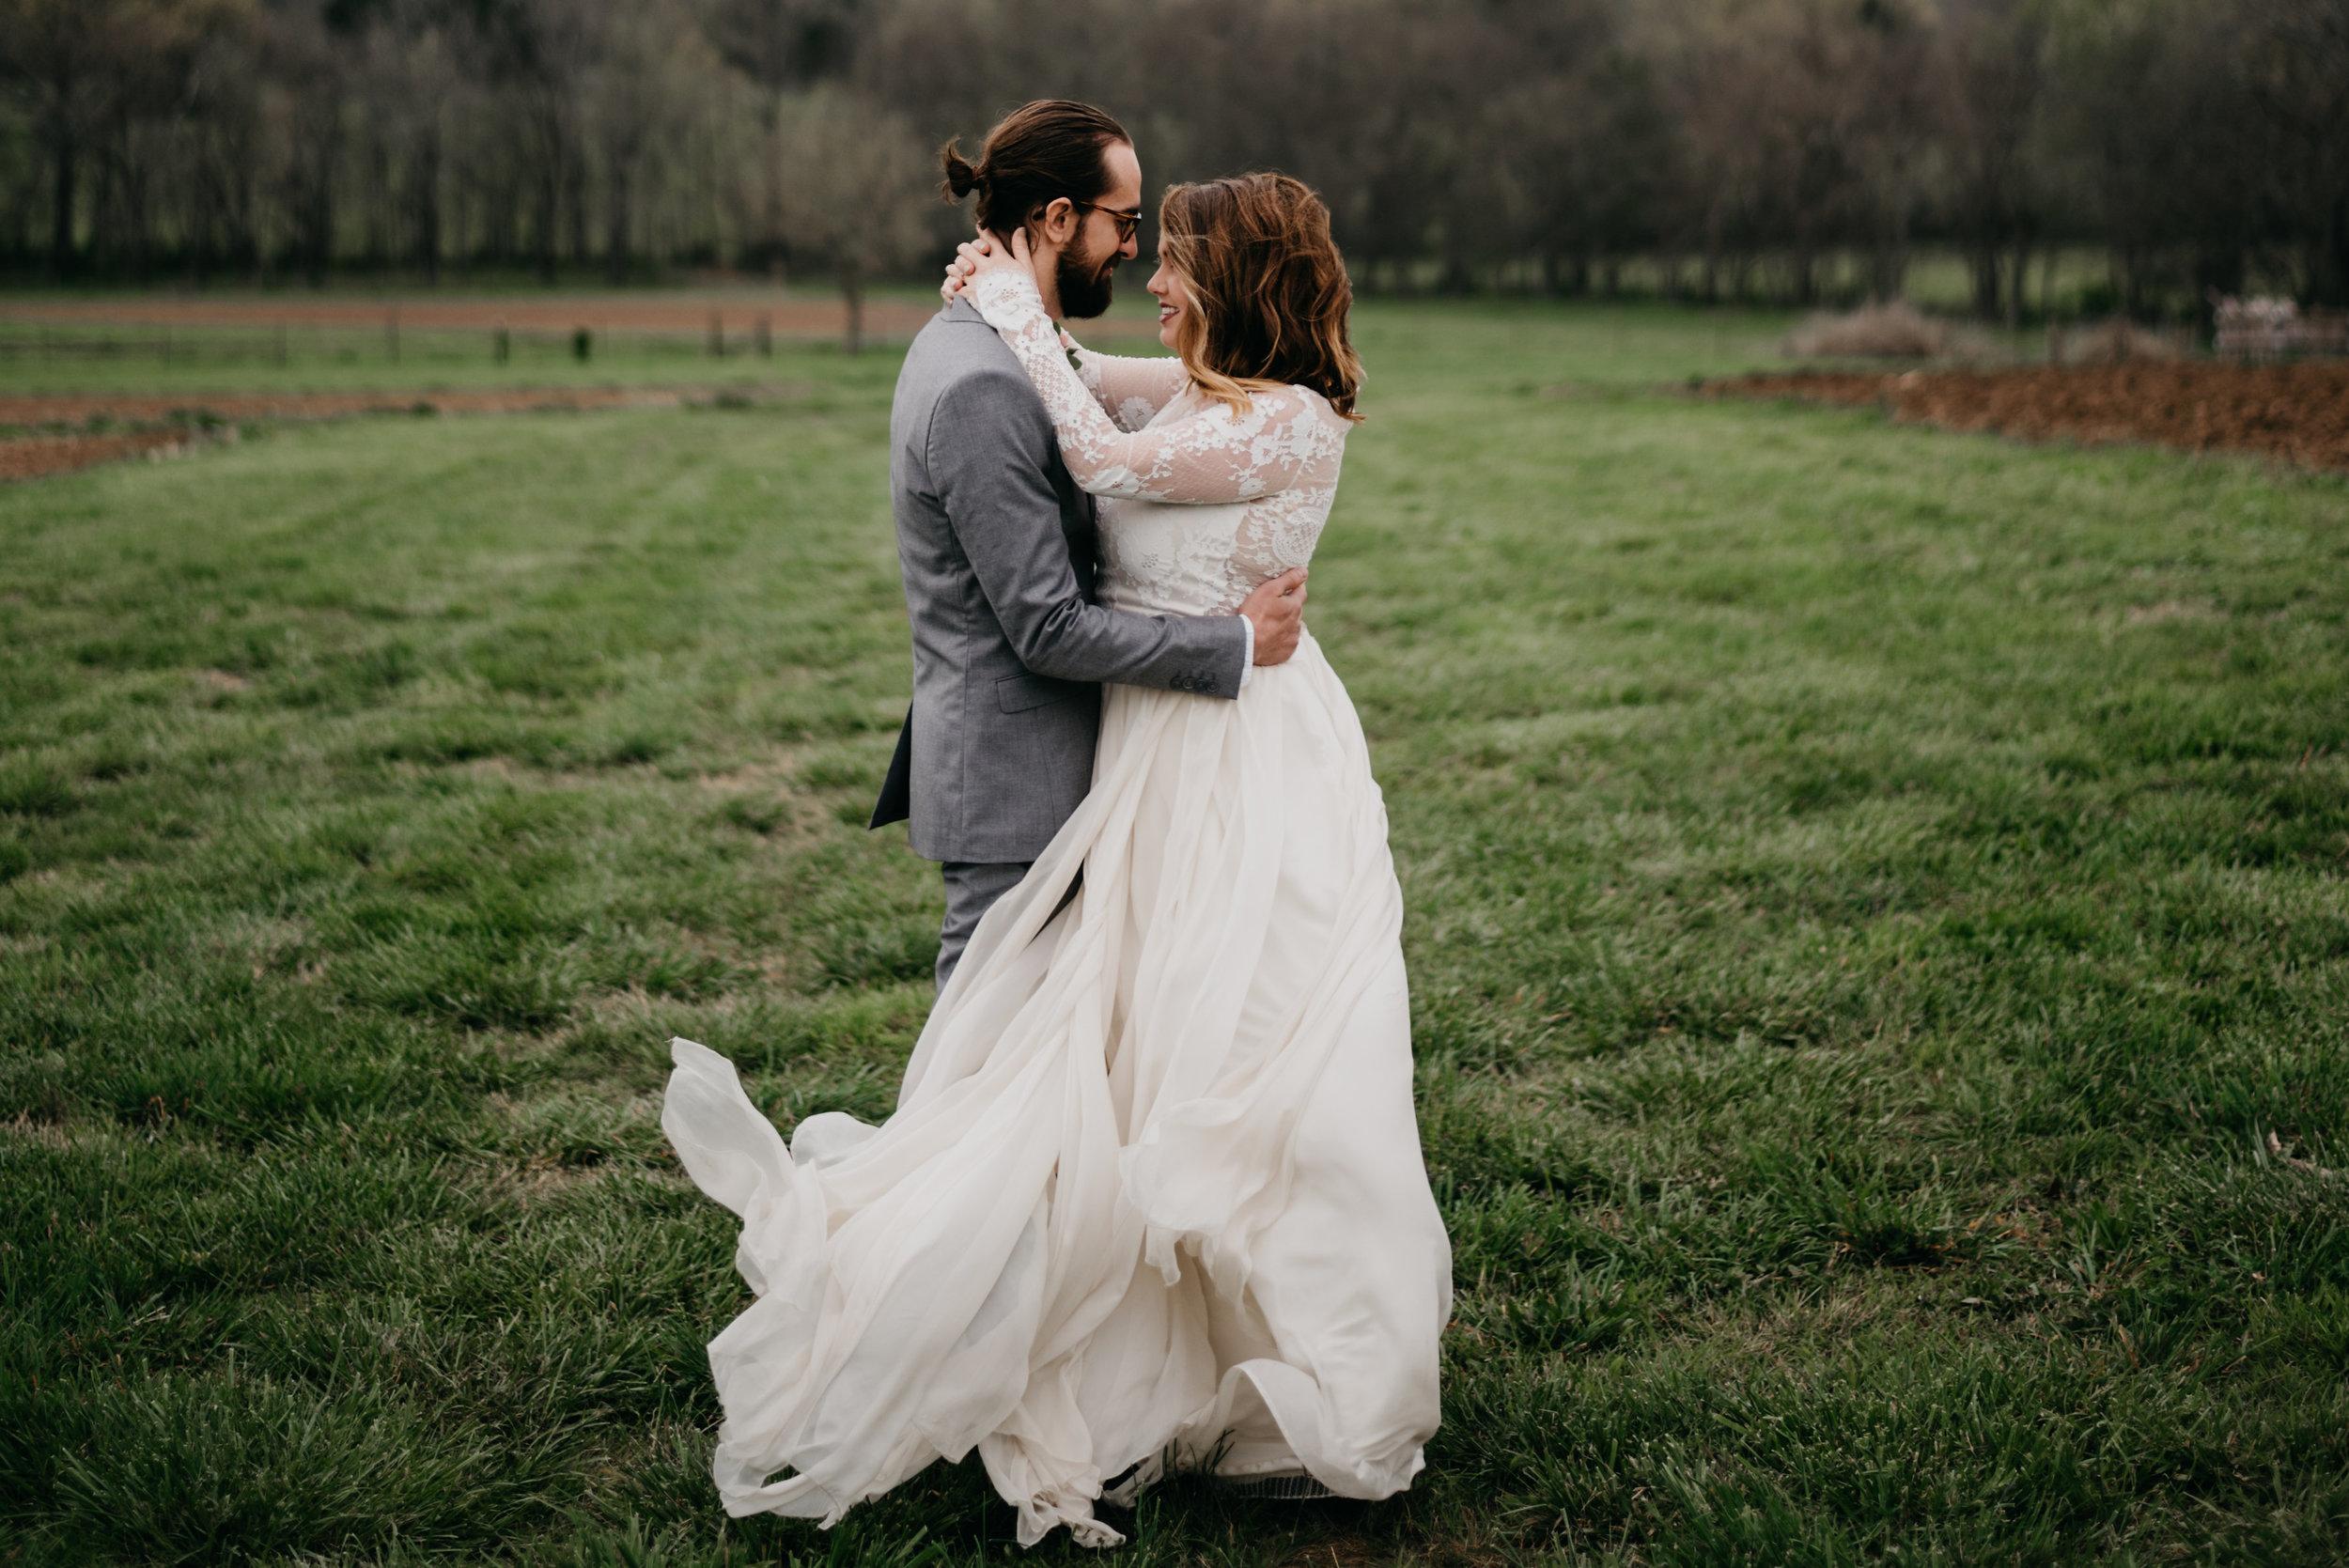 Allenbrooke-Farms-Nashville-Wedding-Photographers 34.jpg